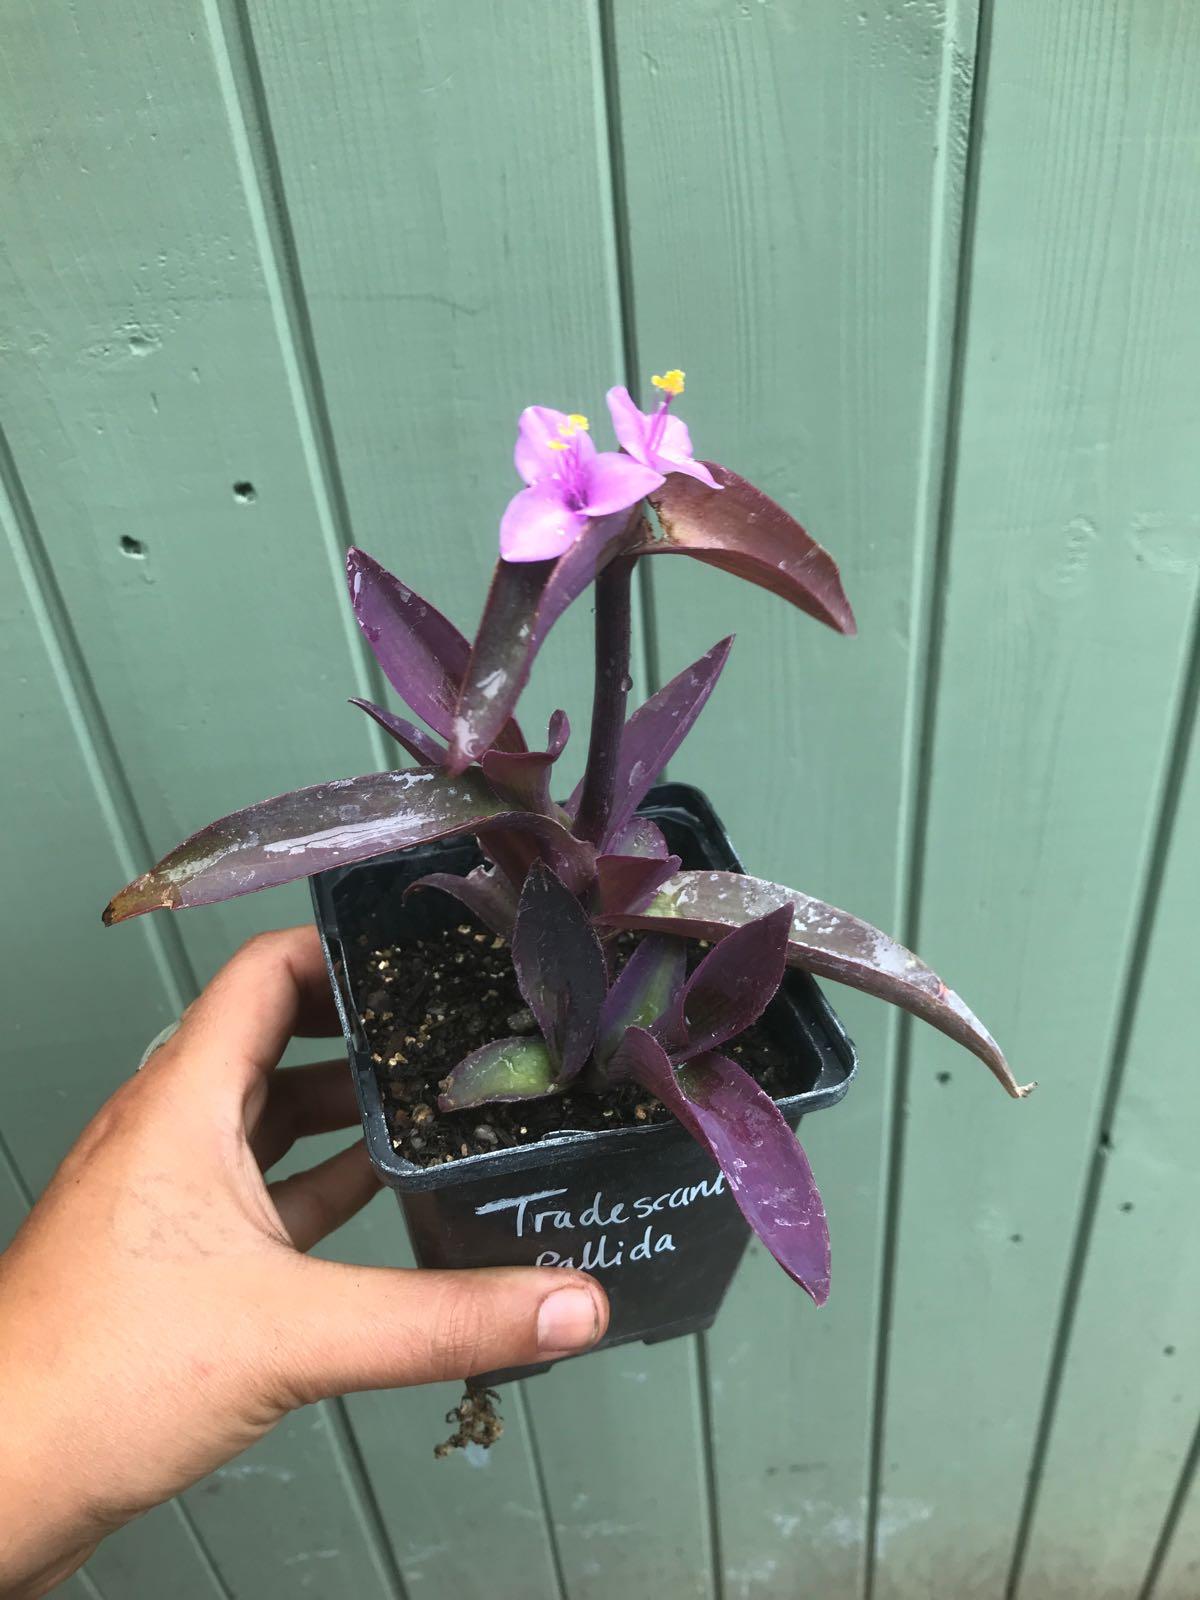 Tradescantia pallida 'Purpurea'  (Purple Spiderwort)